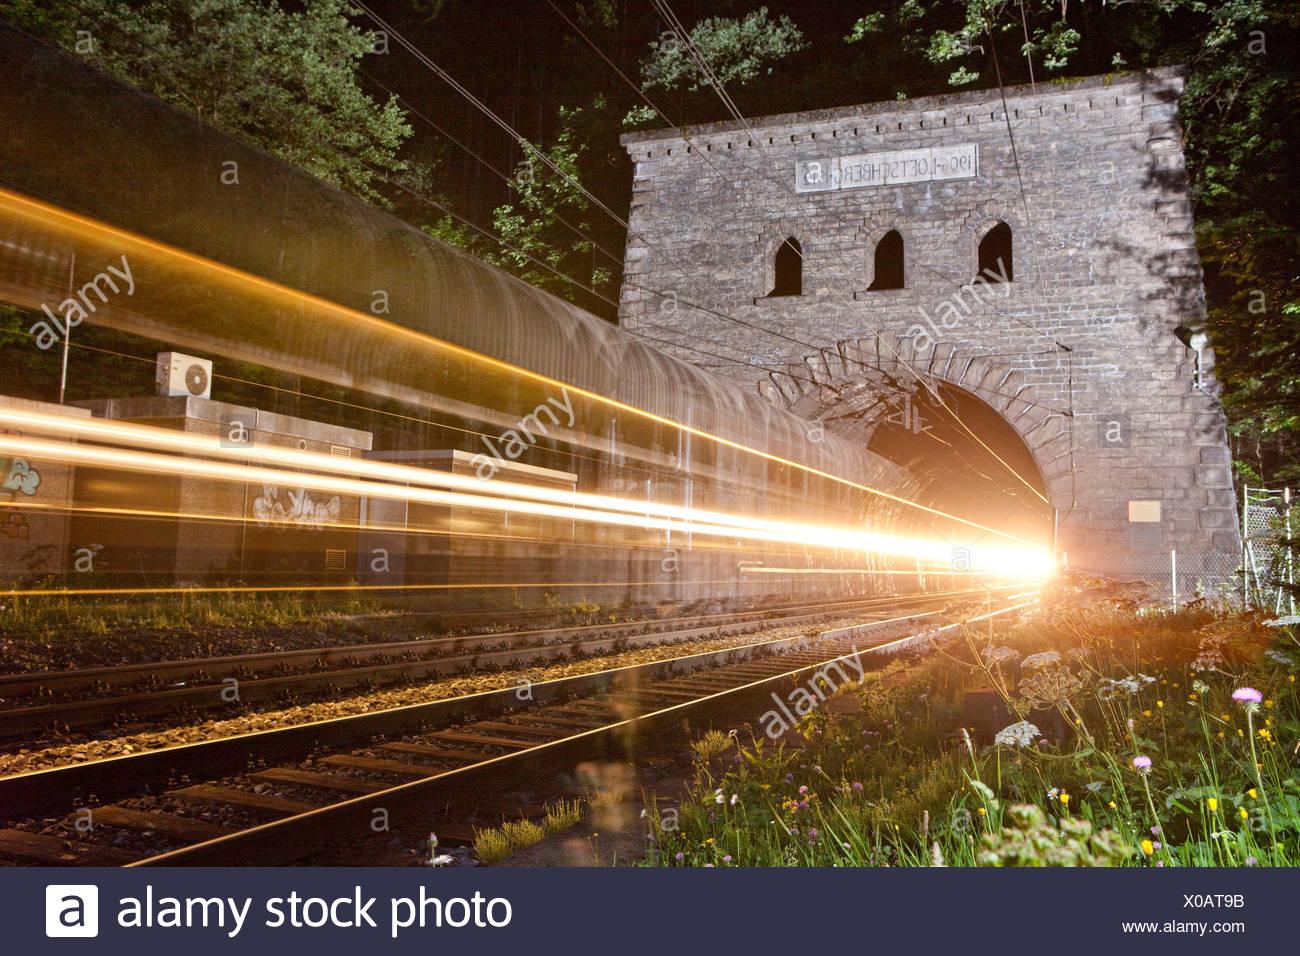 Haupteingang Nord, tunnel, Kandersteg, Straße, Bahn, Zug, Eisenbahn, Lötschberg, BLS, Schweiz, Europa, Berner Oberland, Stockbild